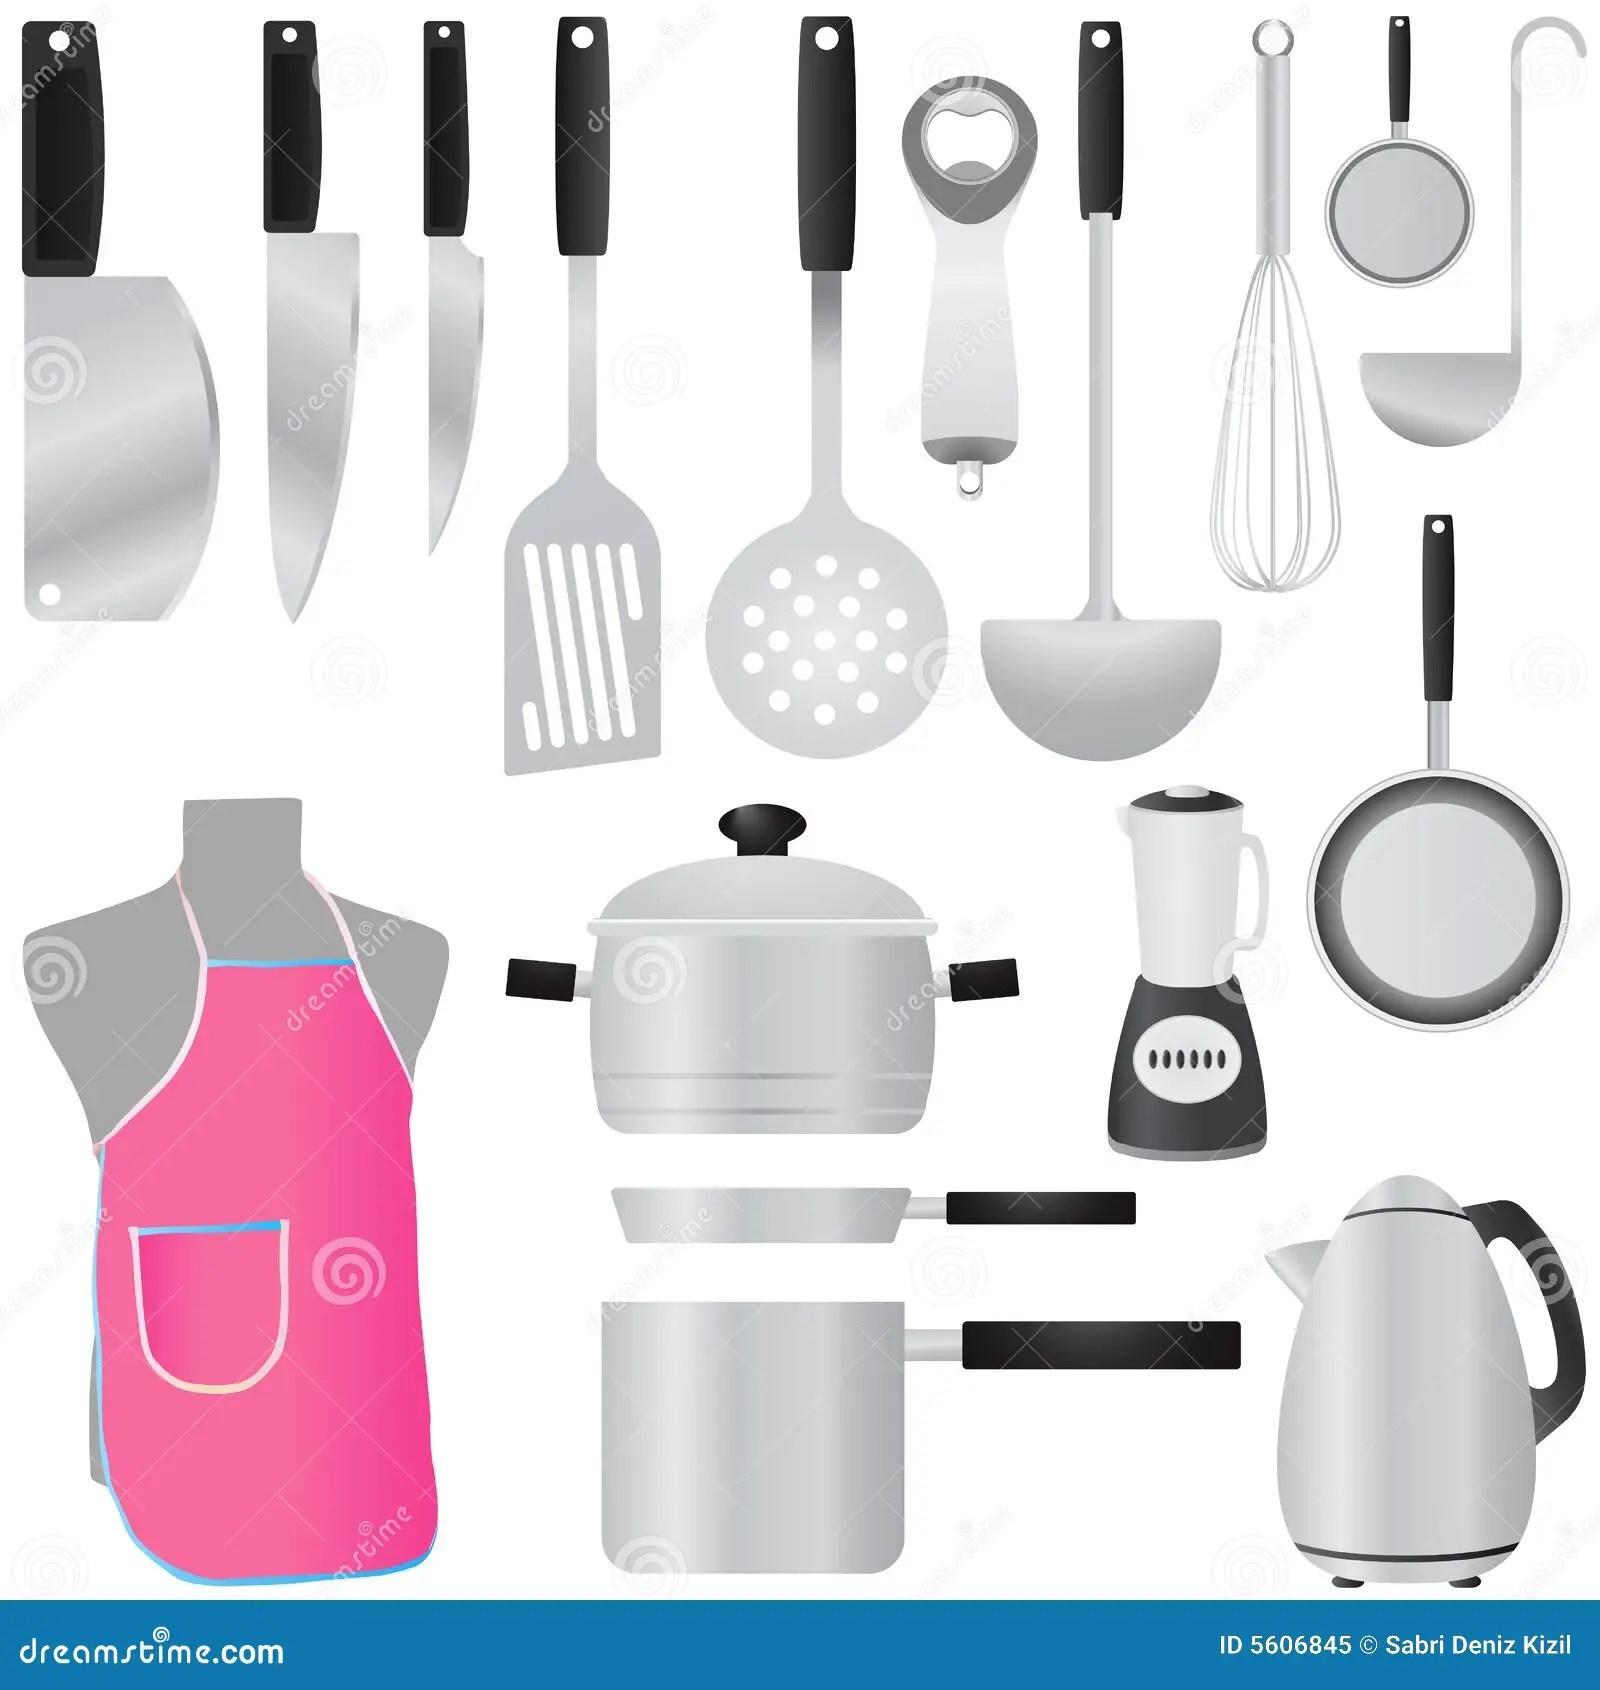 kitchen spatula pot hanger tools vector royalty free stock photo - image: 5606845